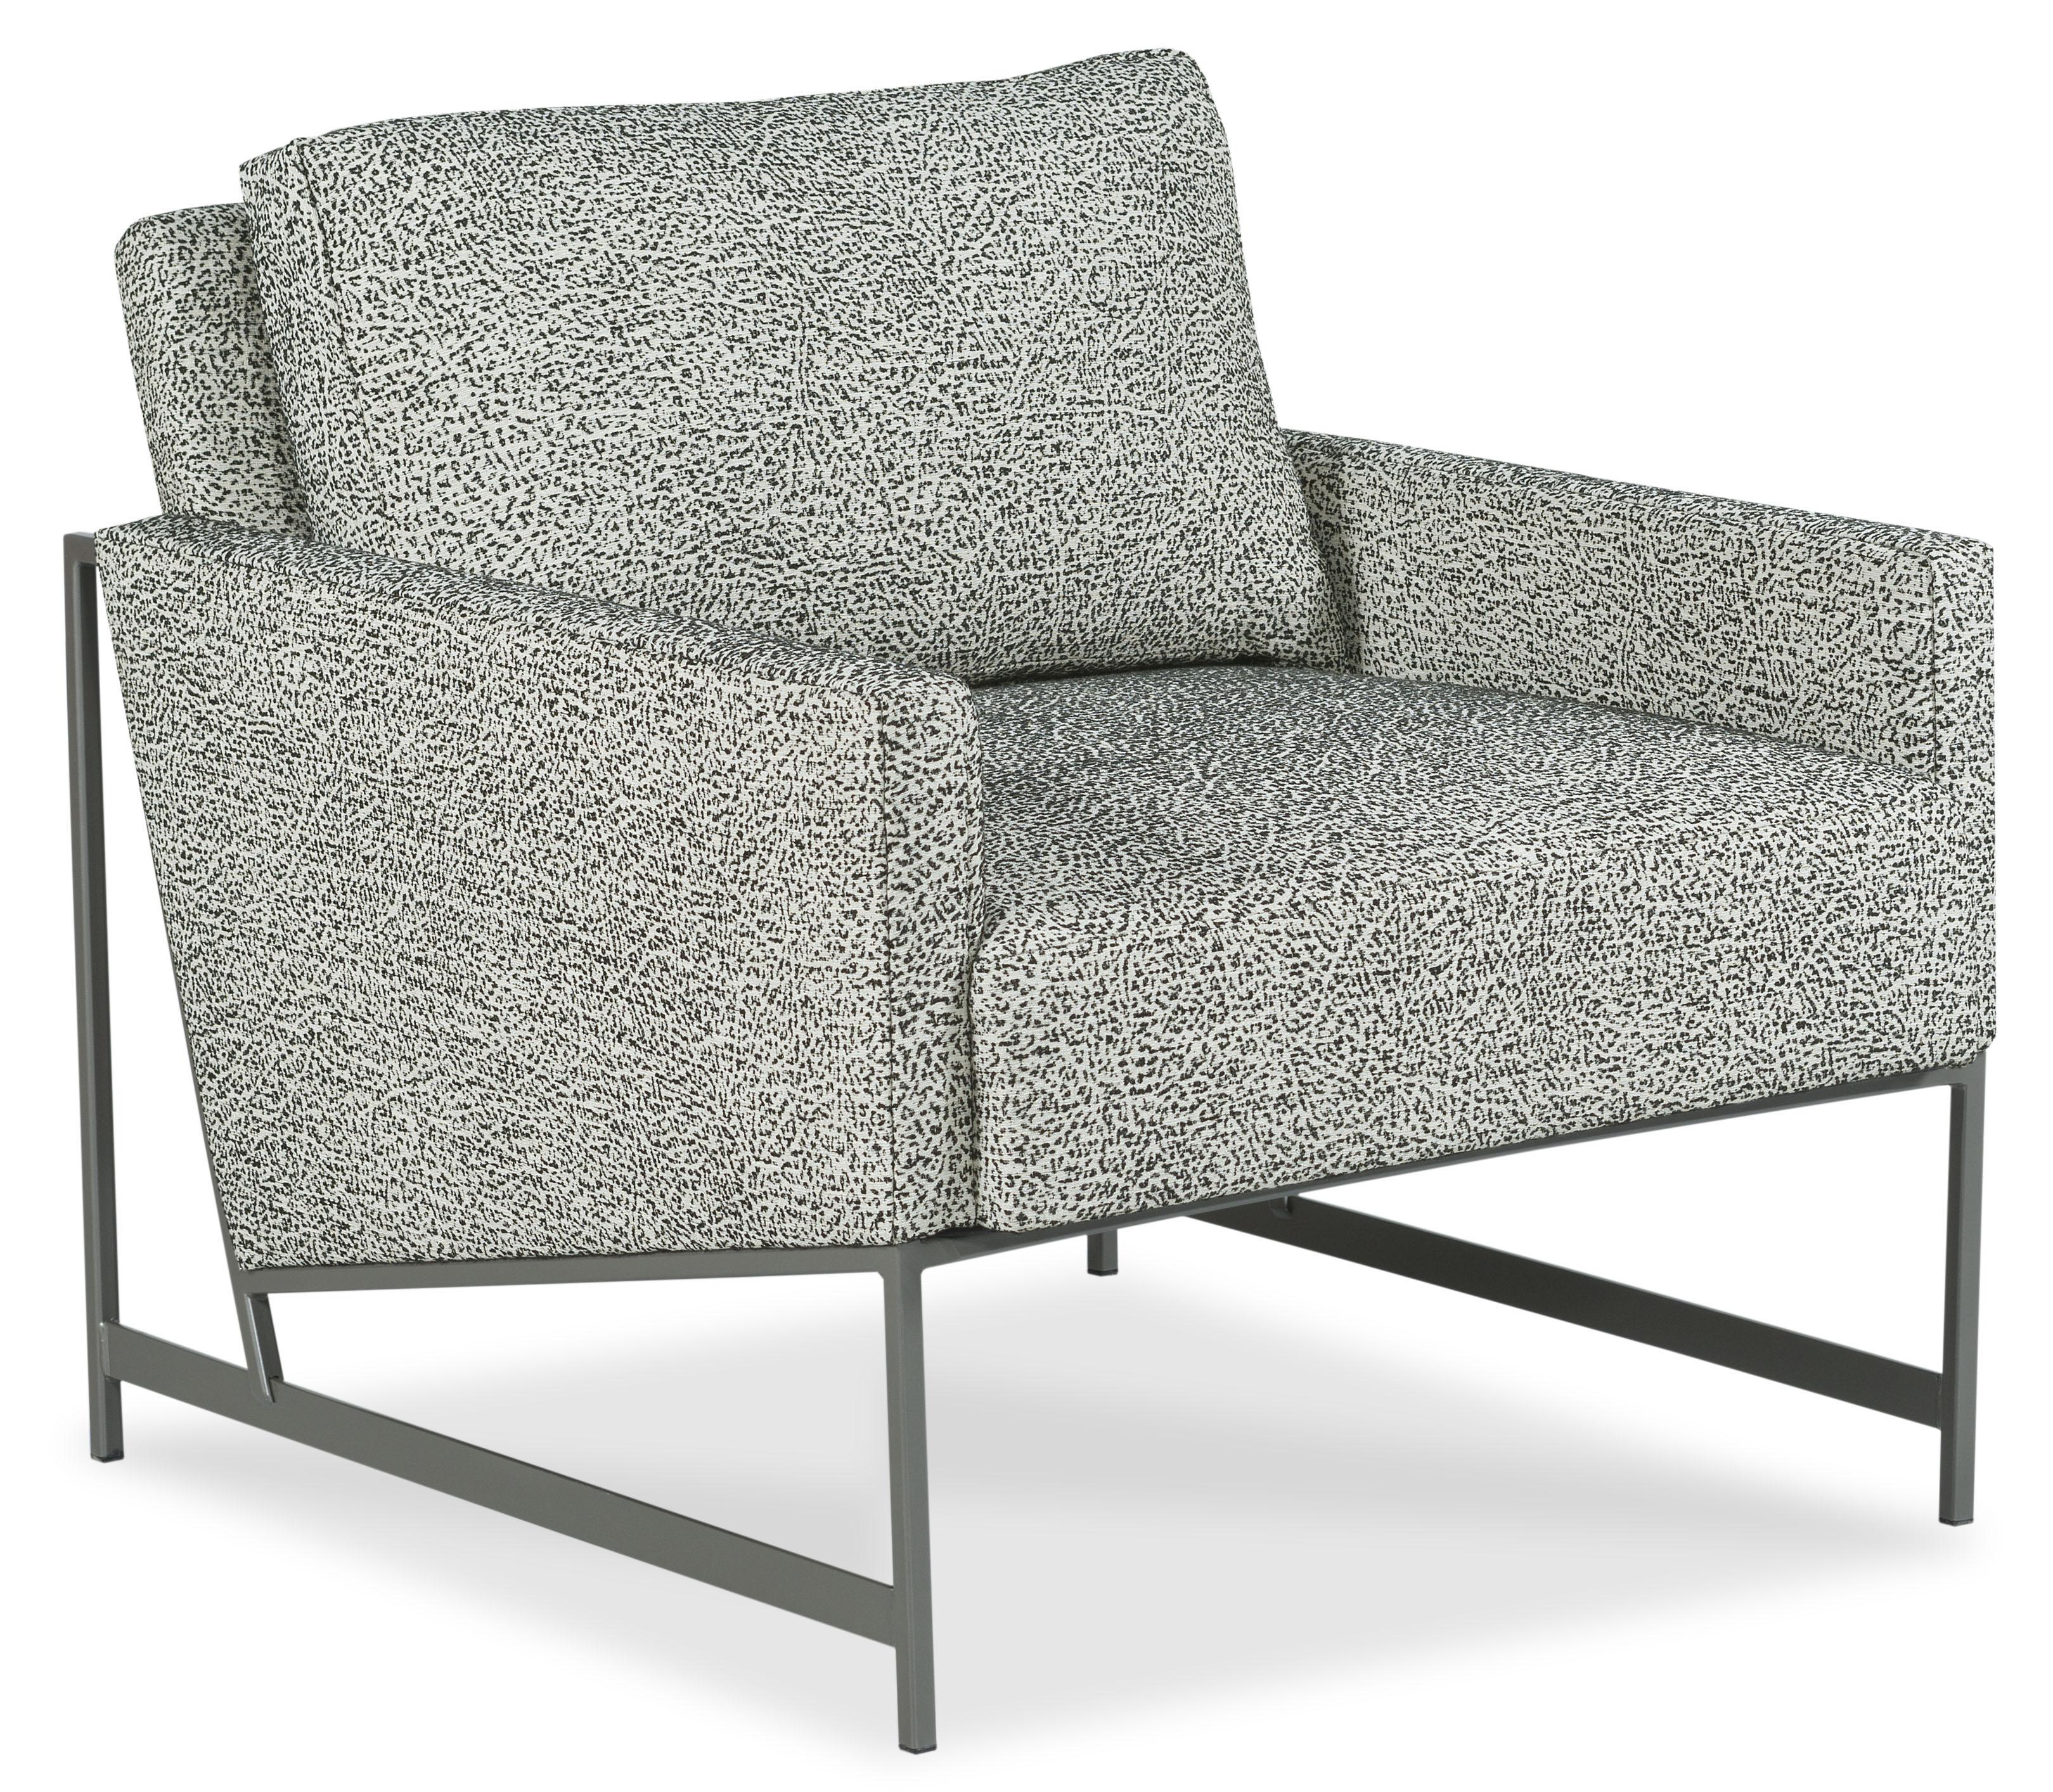 Sparta Occasional Chair by Fairfield - 2534027   Oskar ... on Sparta Outdoor Living id=68497